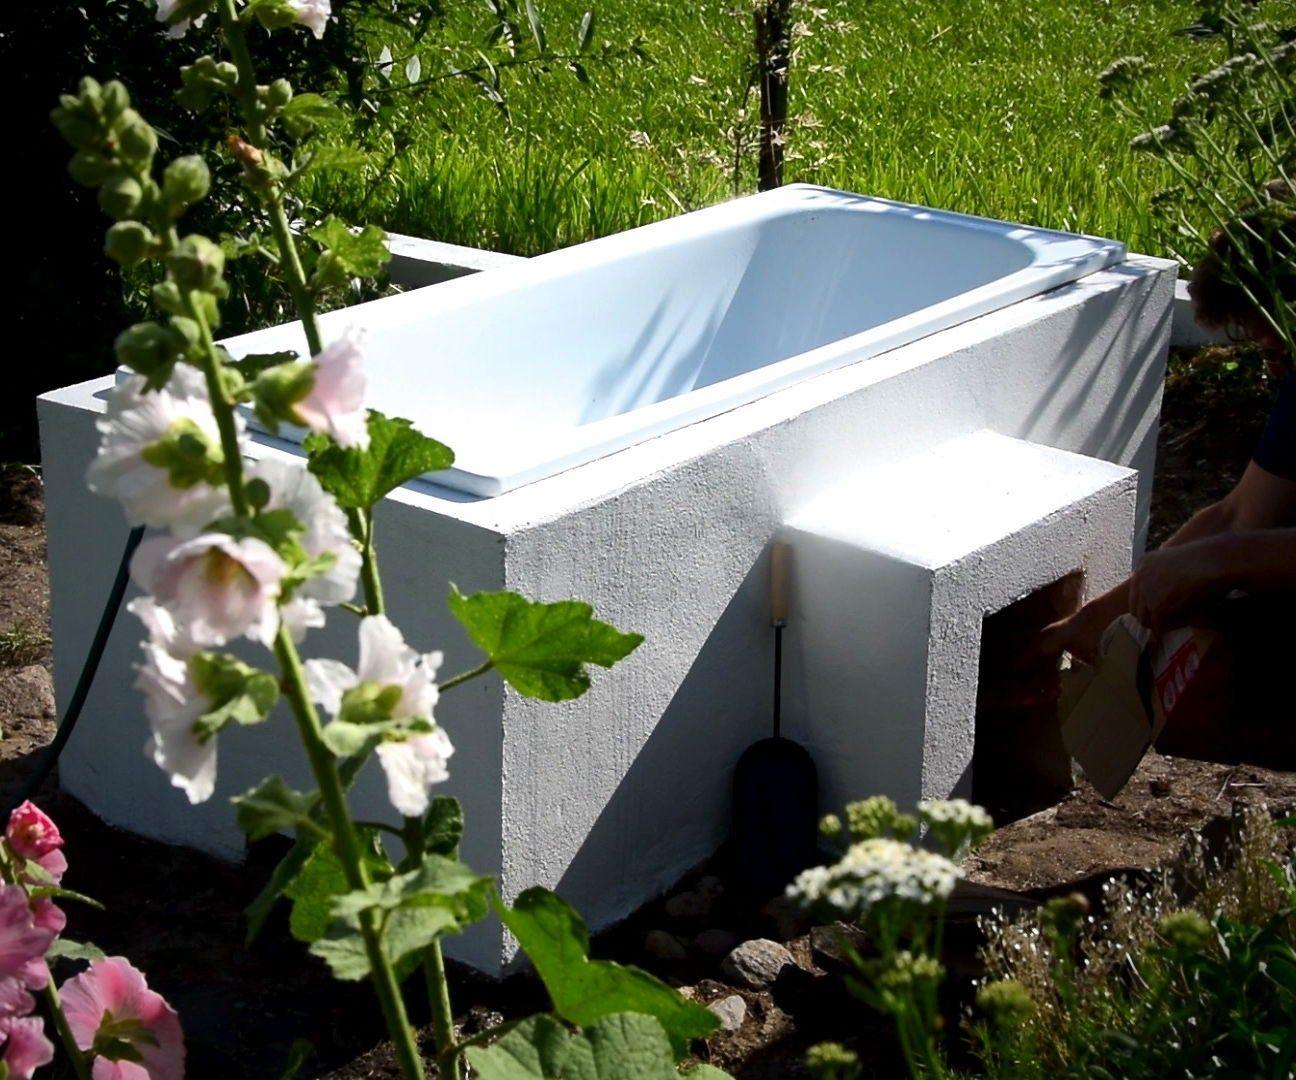 Diy hot wood fired tub 20 for relax in garden backyard